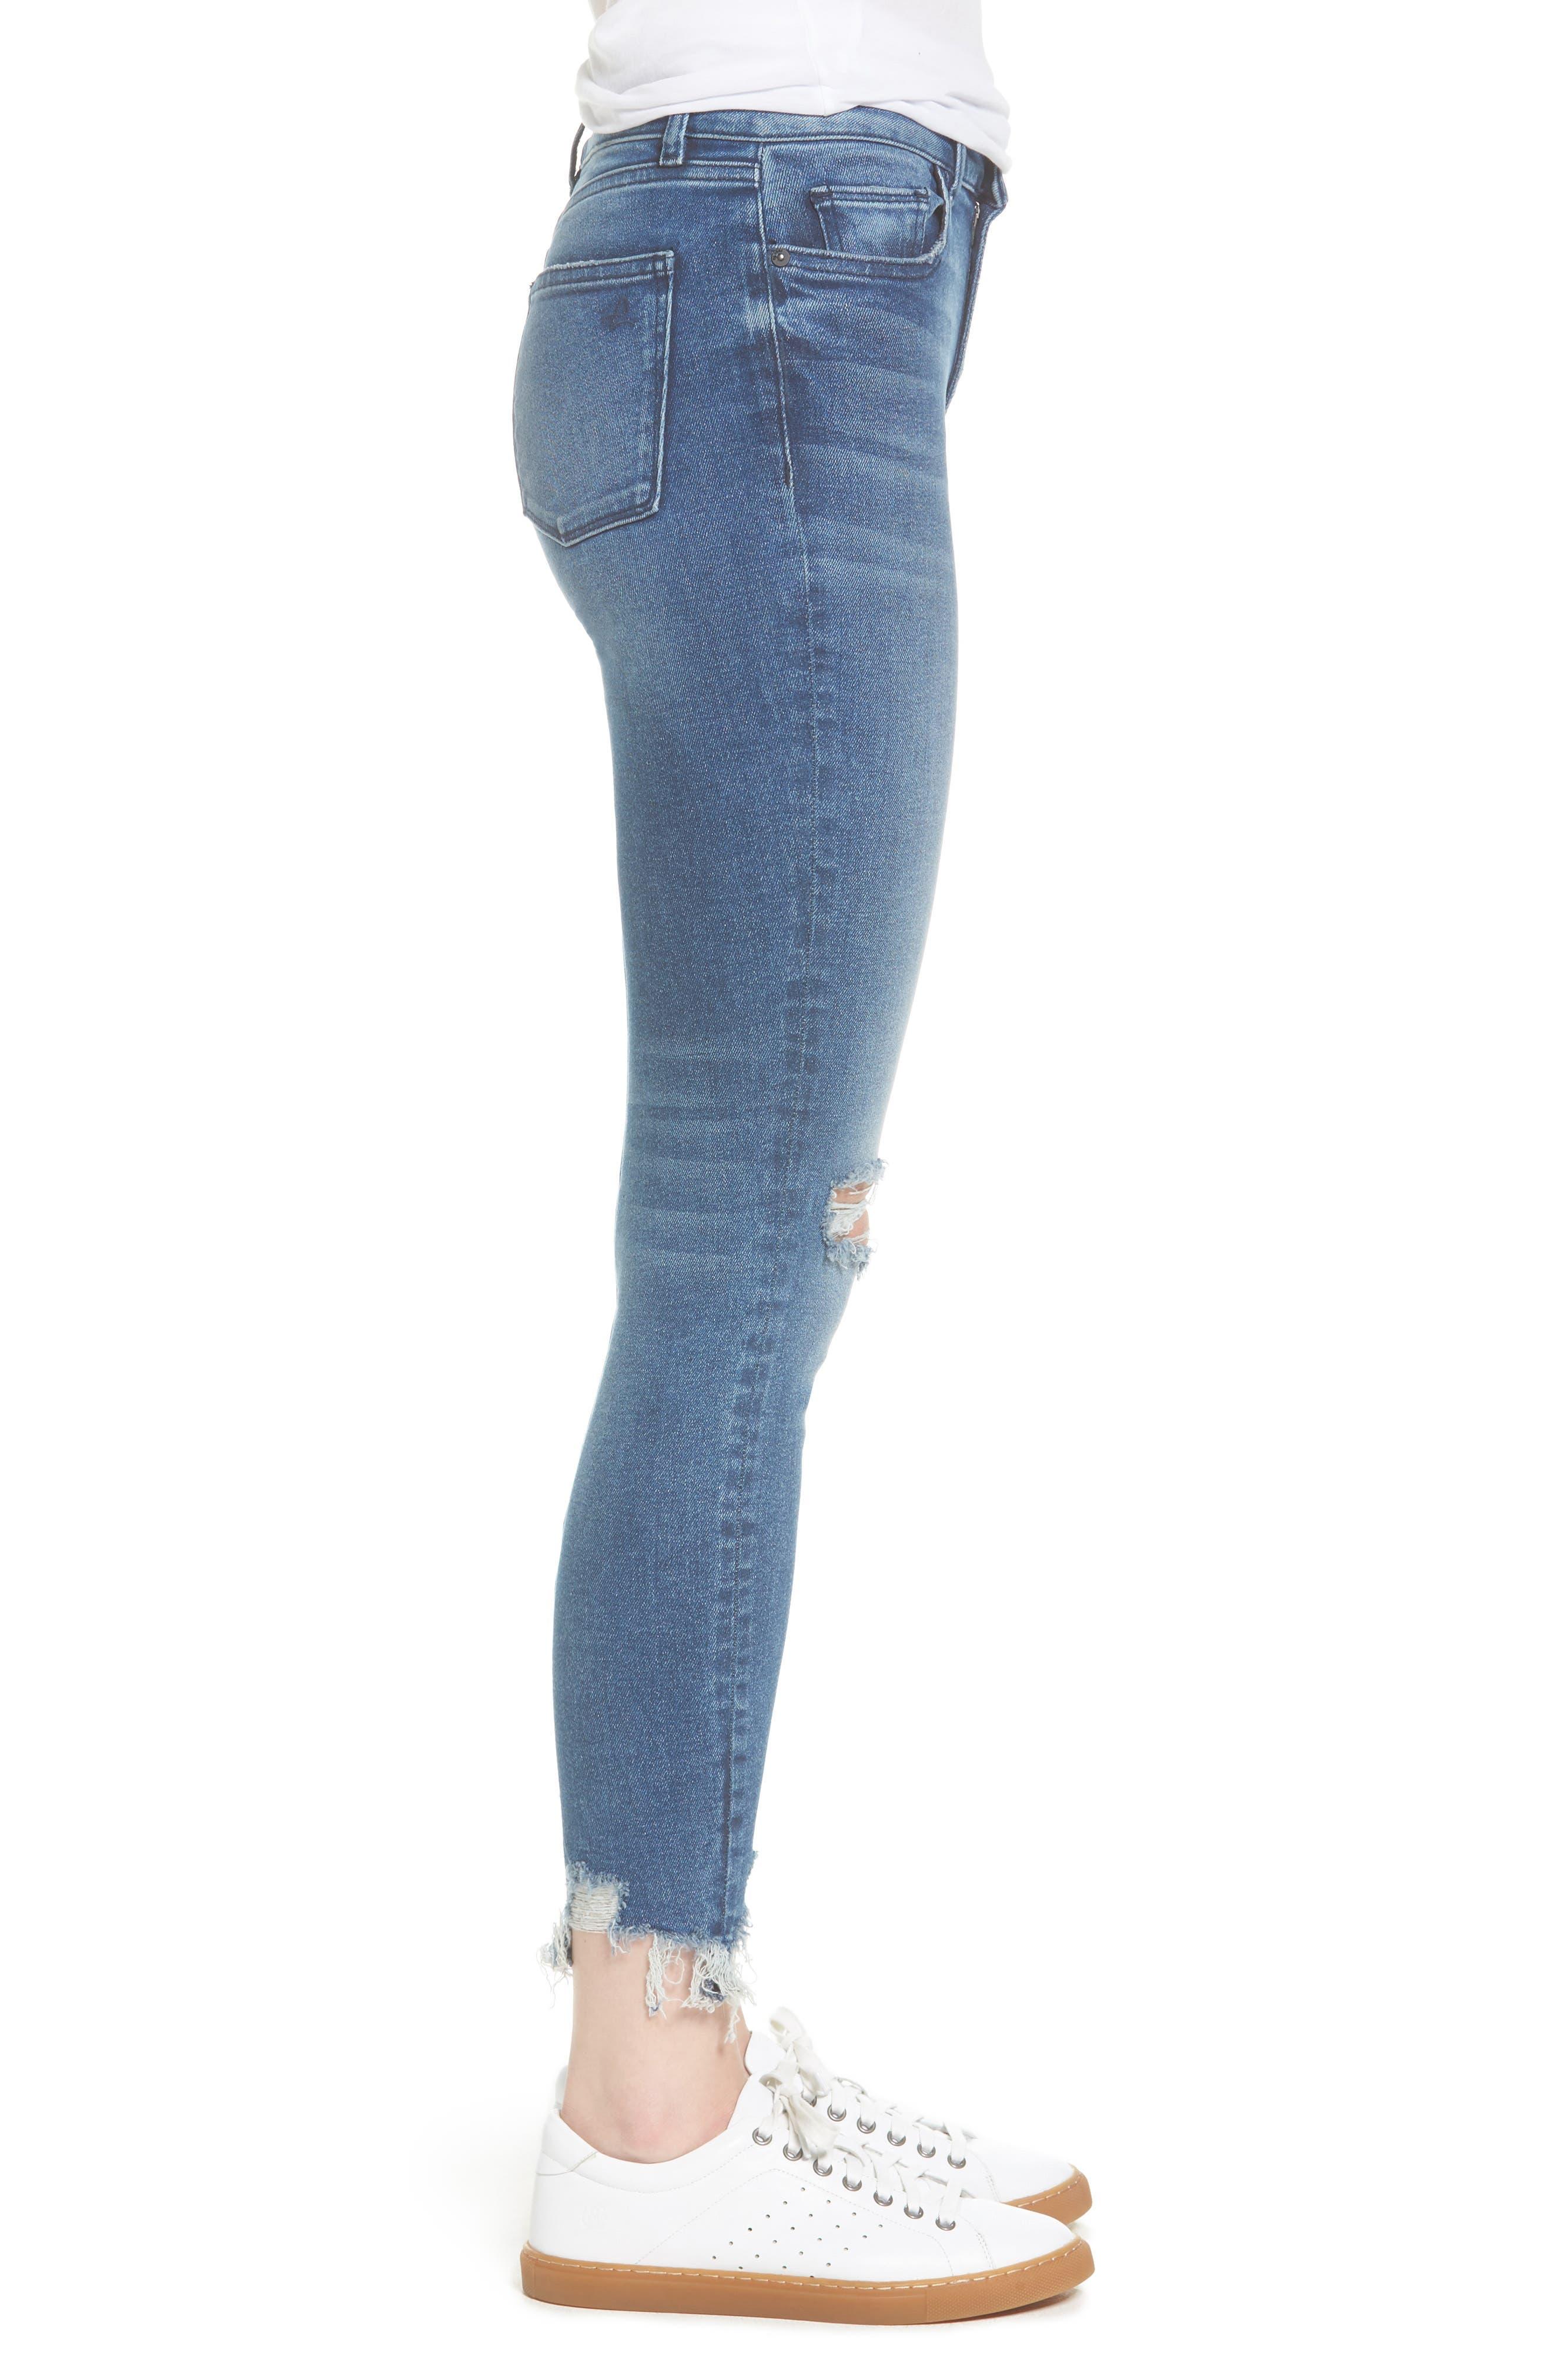 Farrow Instaslim High Waist Ankle Skinny Jeans,                             Alternate thumbnail 3, color,                             Laramie